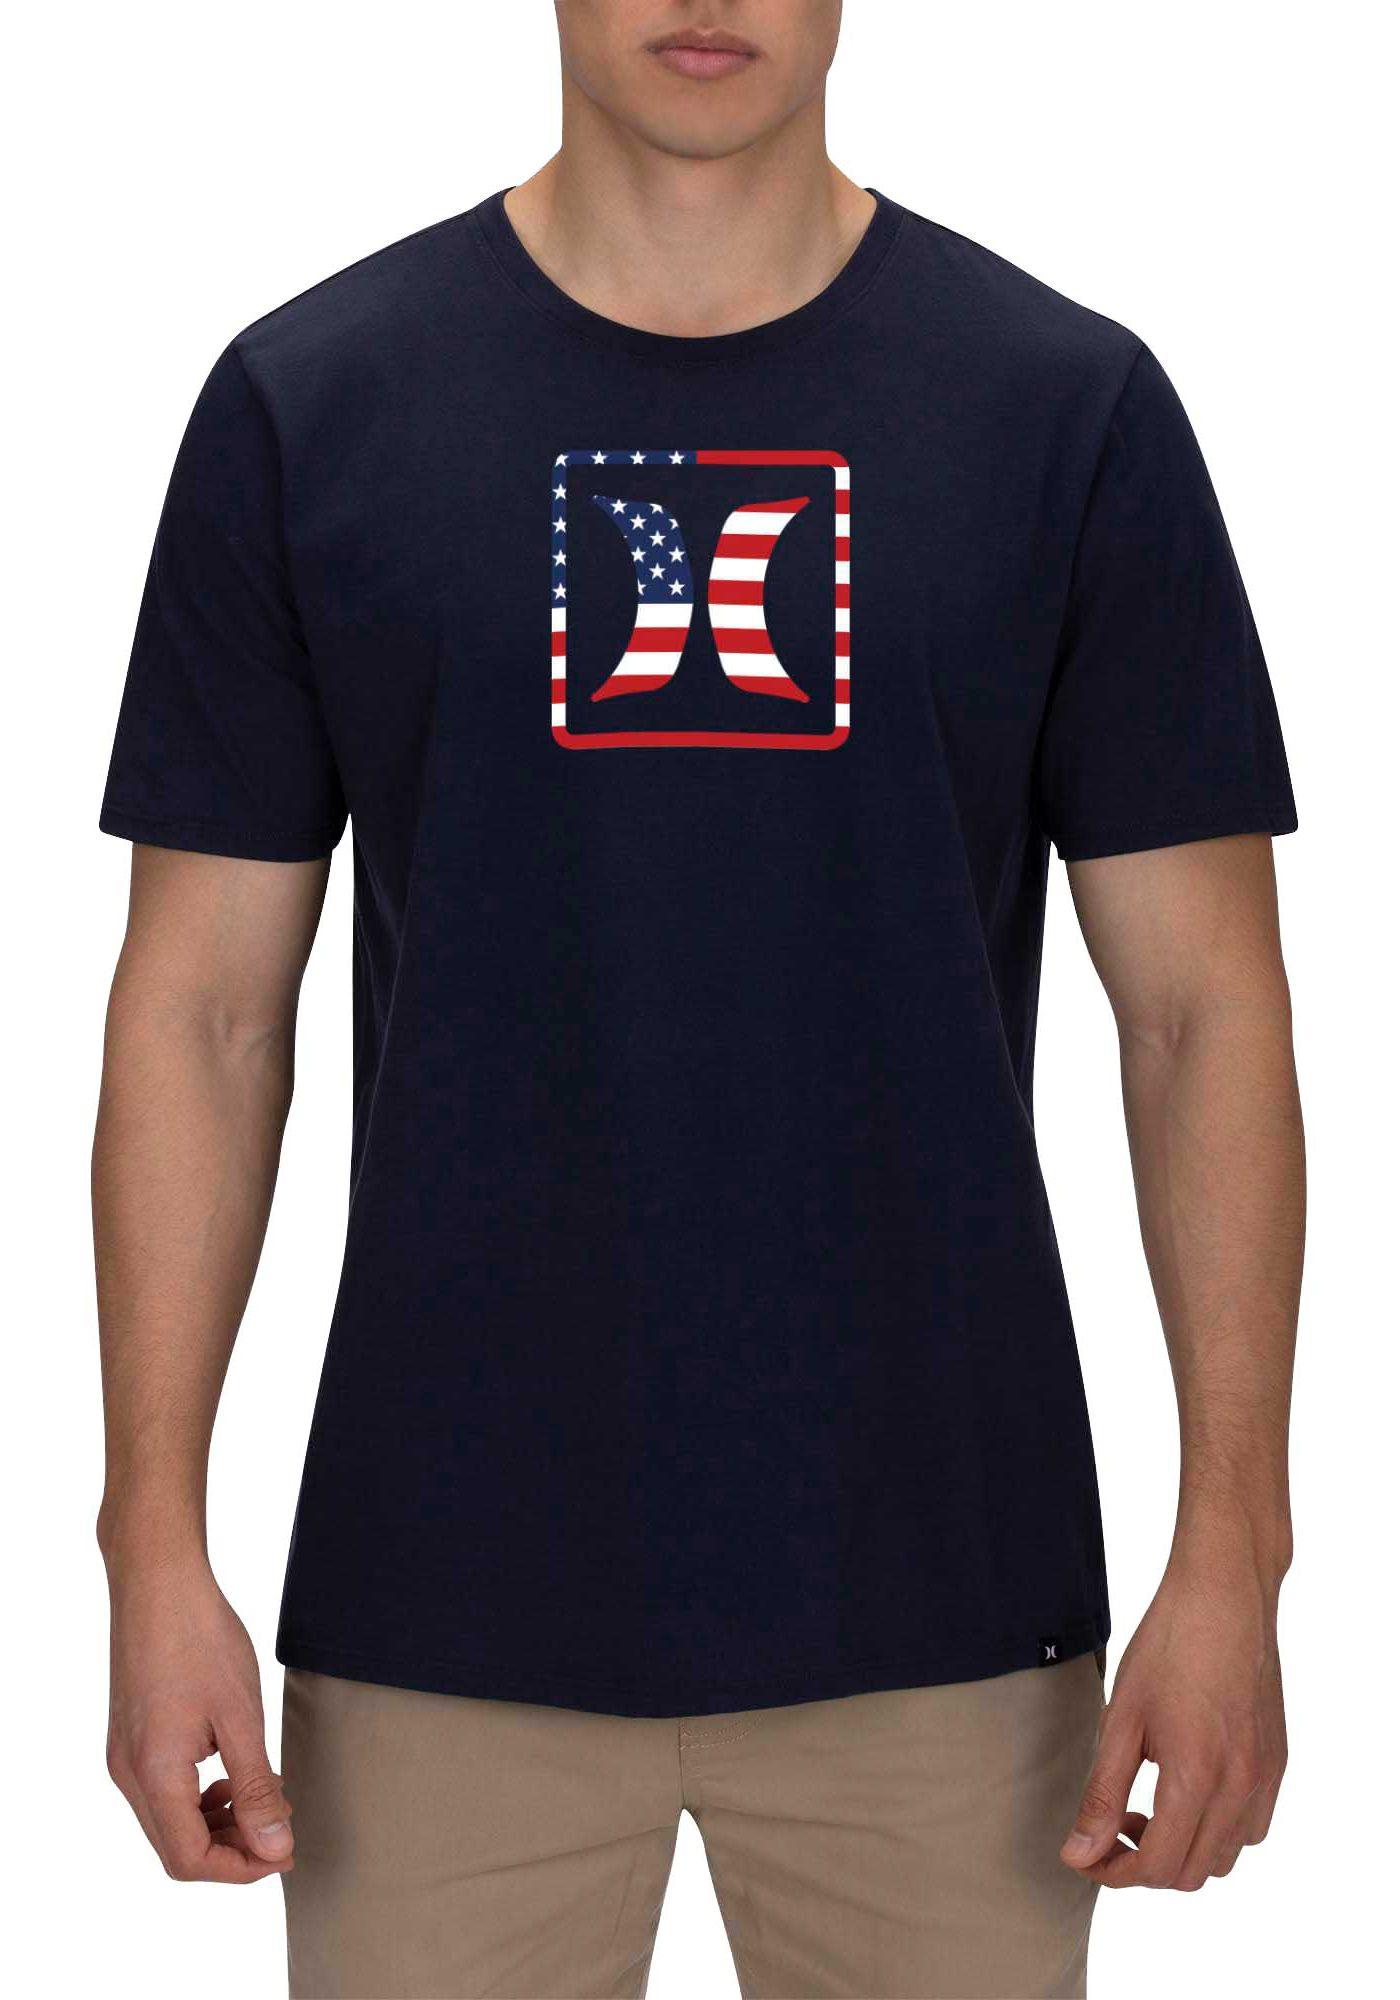 Hurley Men's Block USA T-Shirt